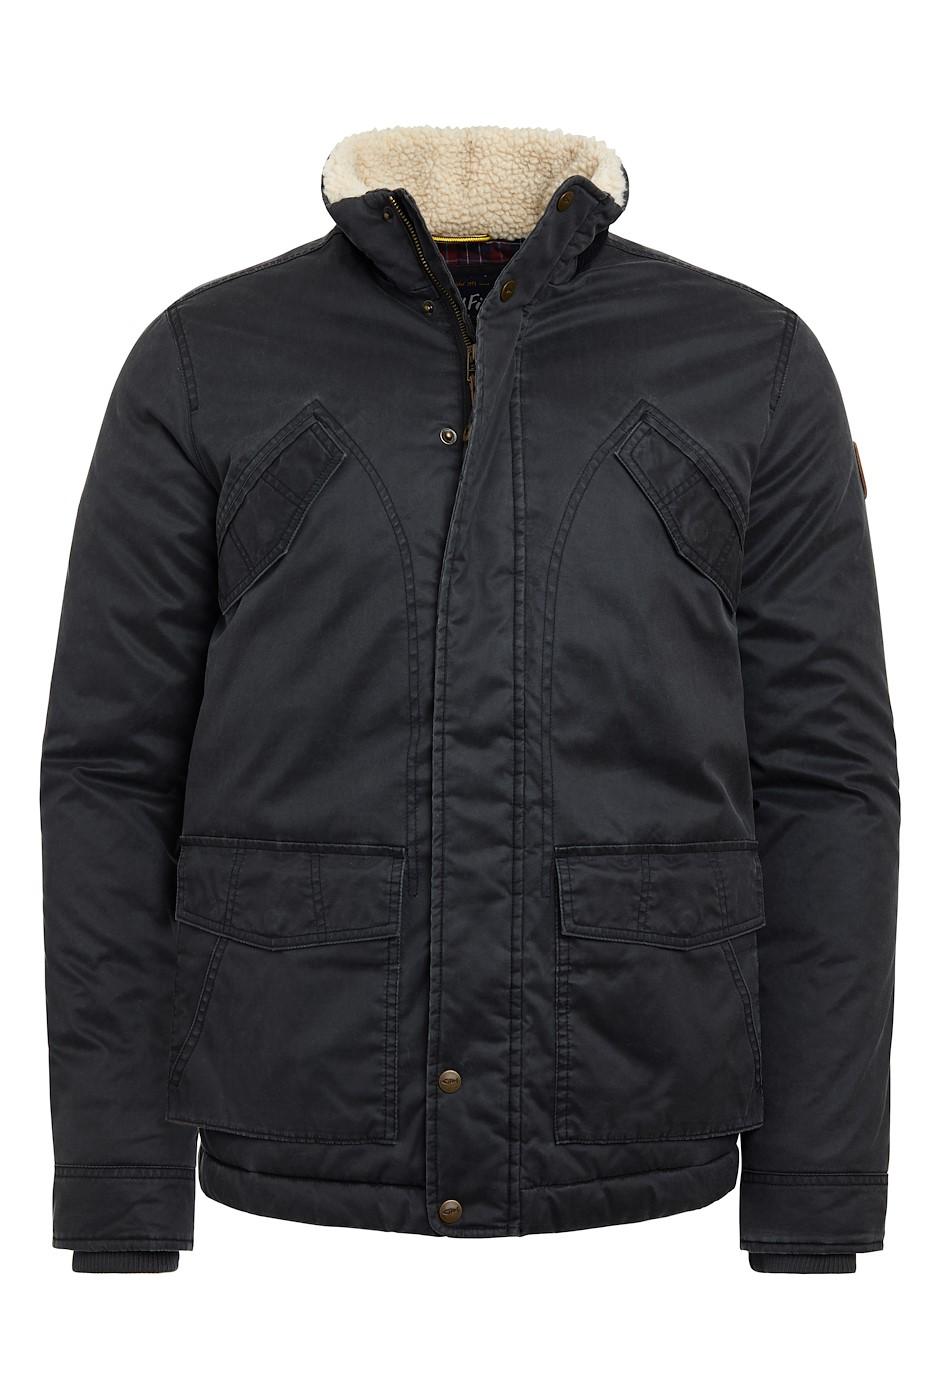 Seabrook Pigment Printed Wadded Jacket Washed Black